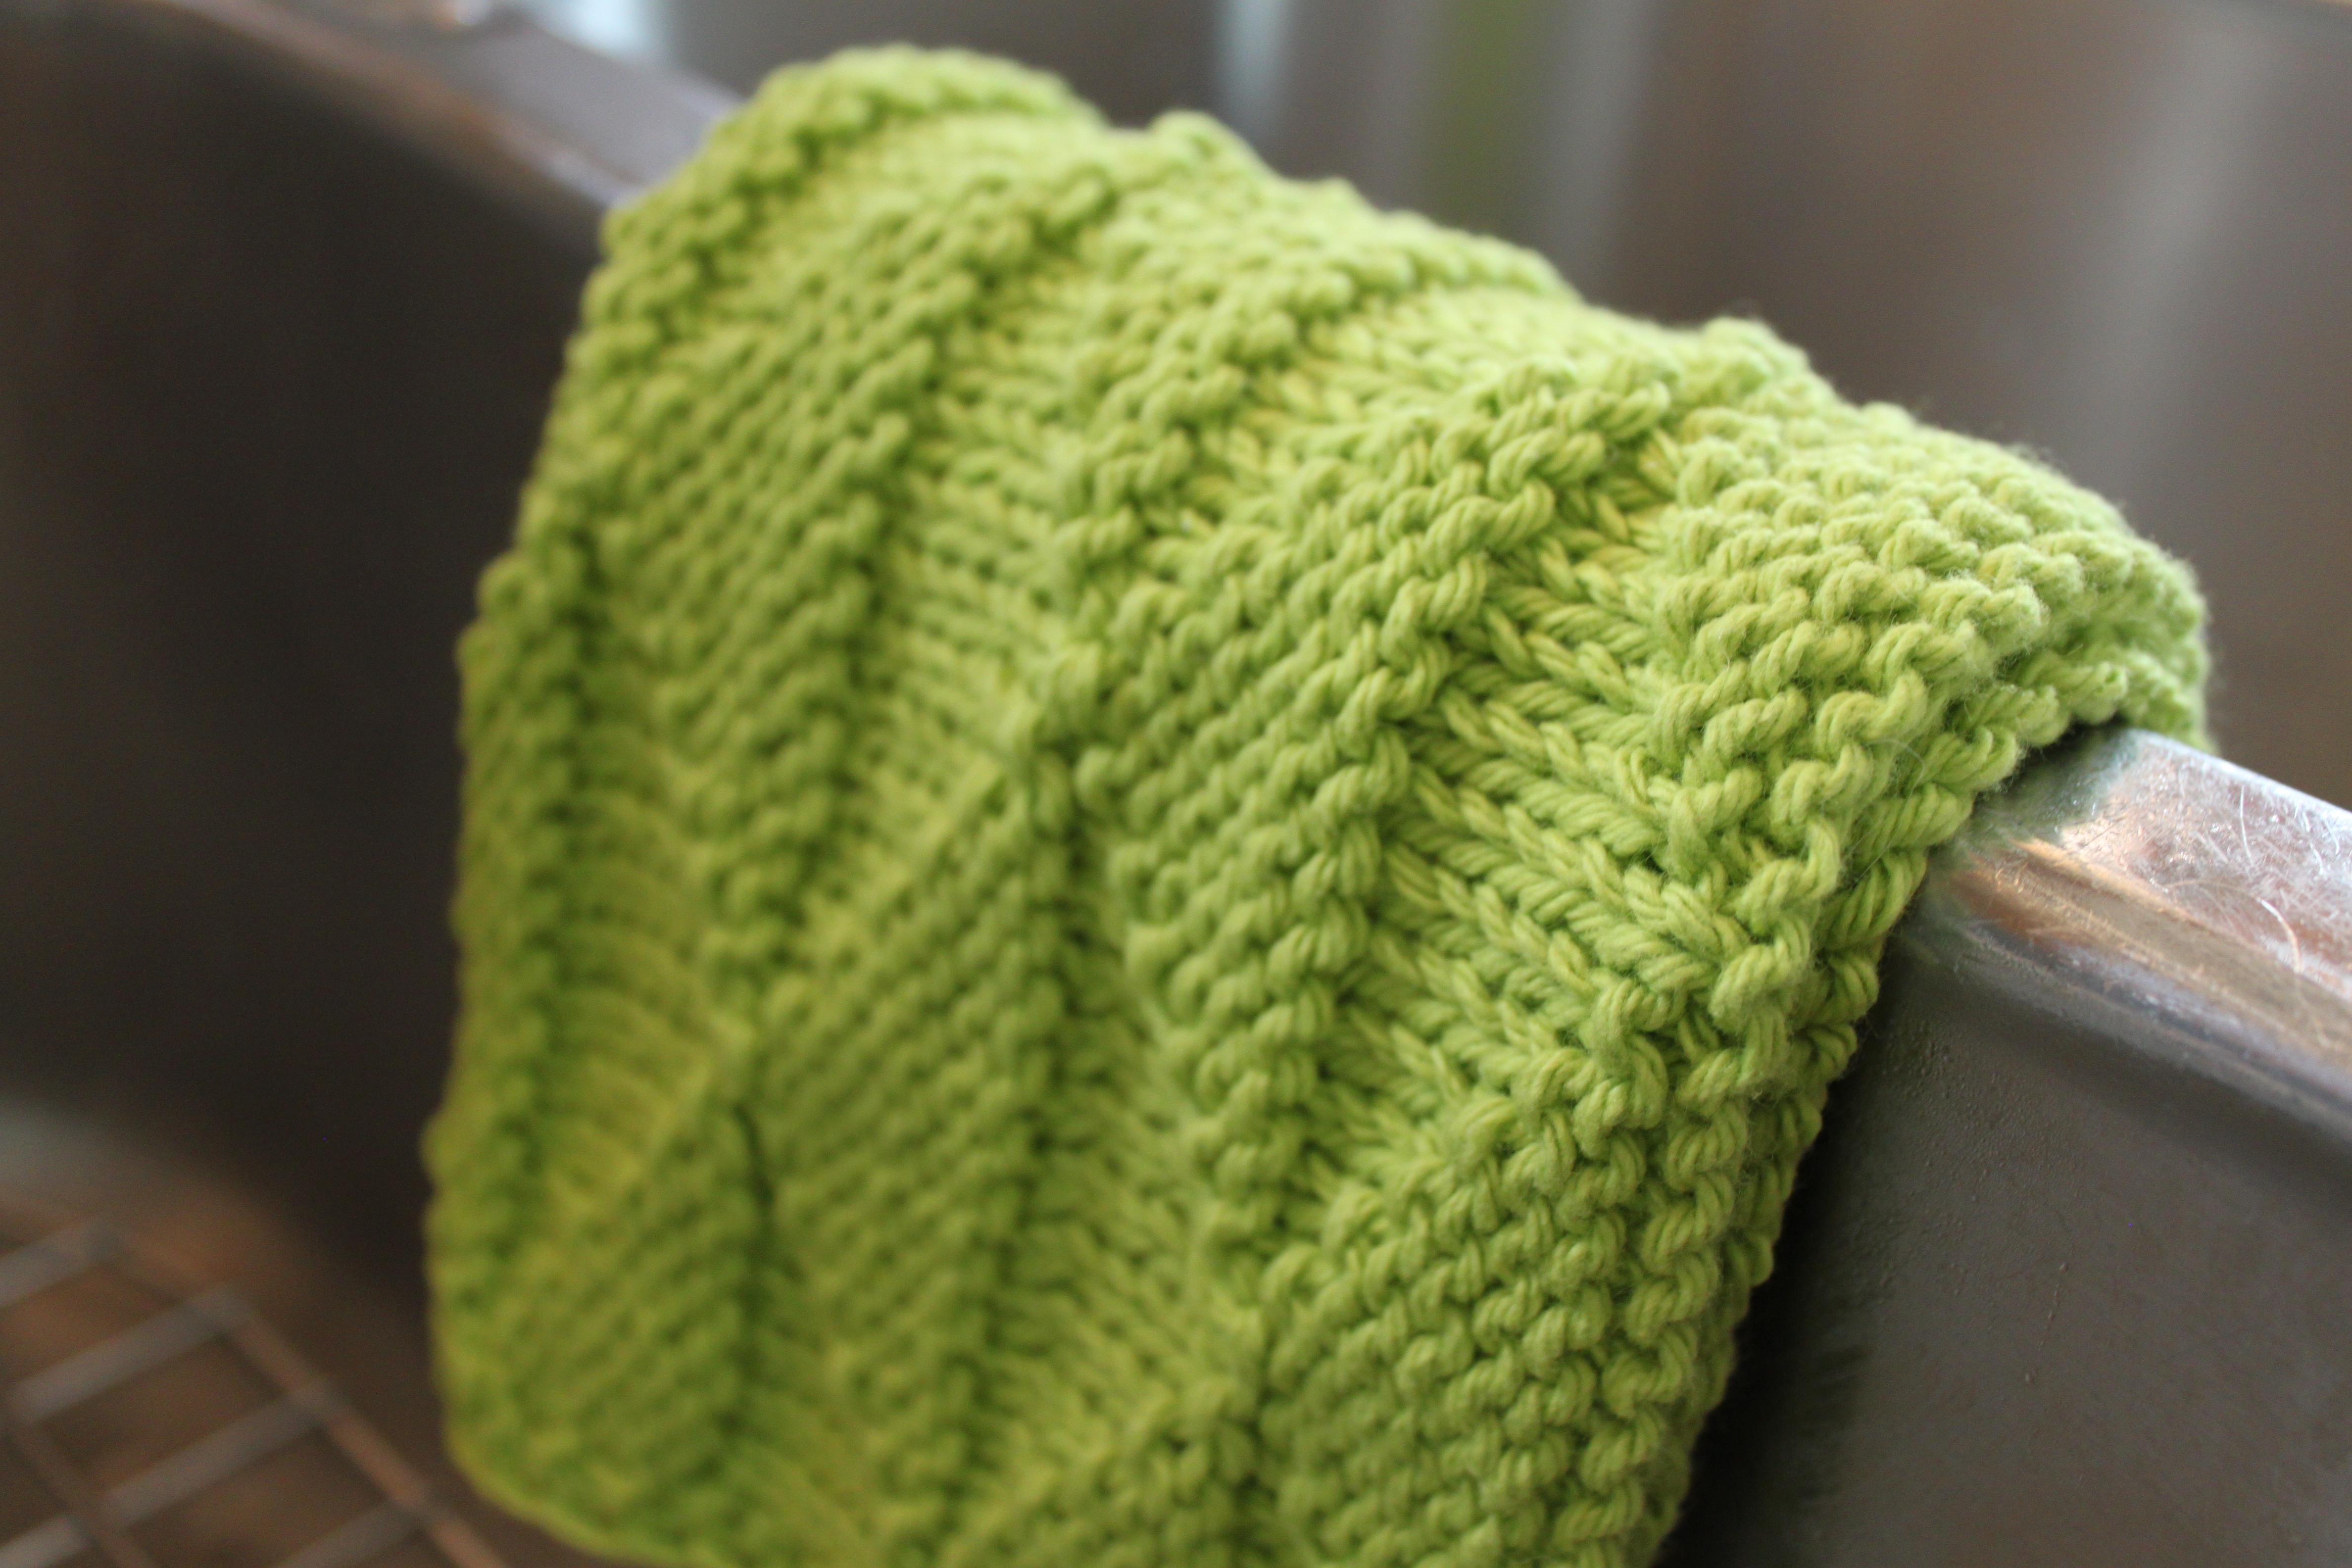 Bernat Knitting Pattern Abbreviations : Isosceles Dishcloth - Leah Michelle Designs